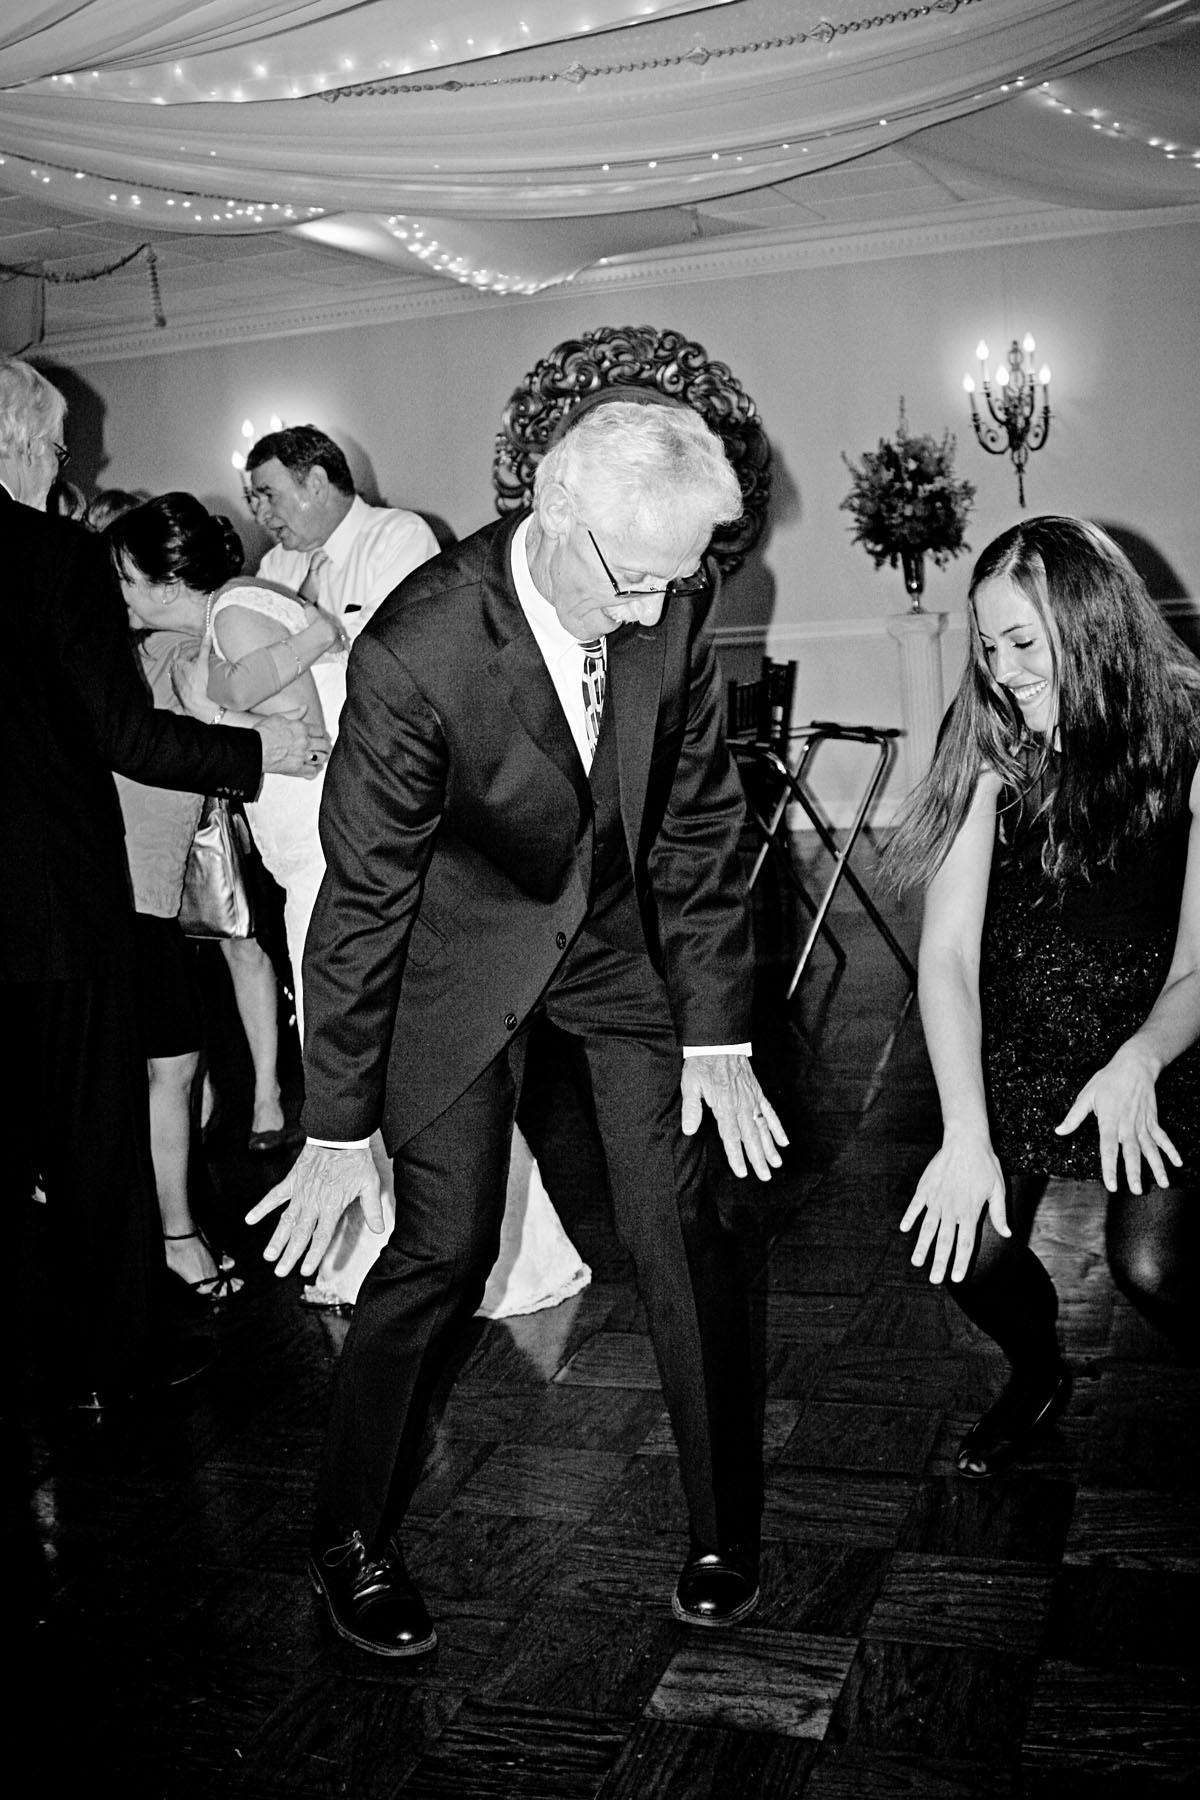 lenny_amy_dancing_bw_2.jpg